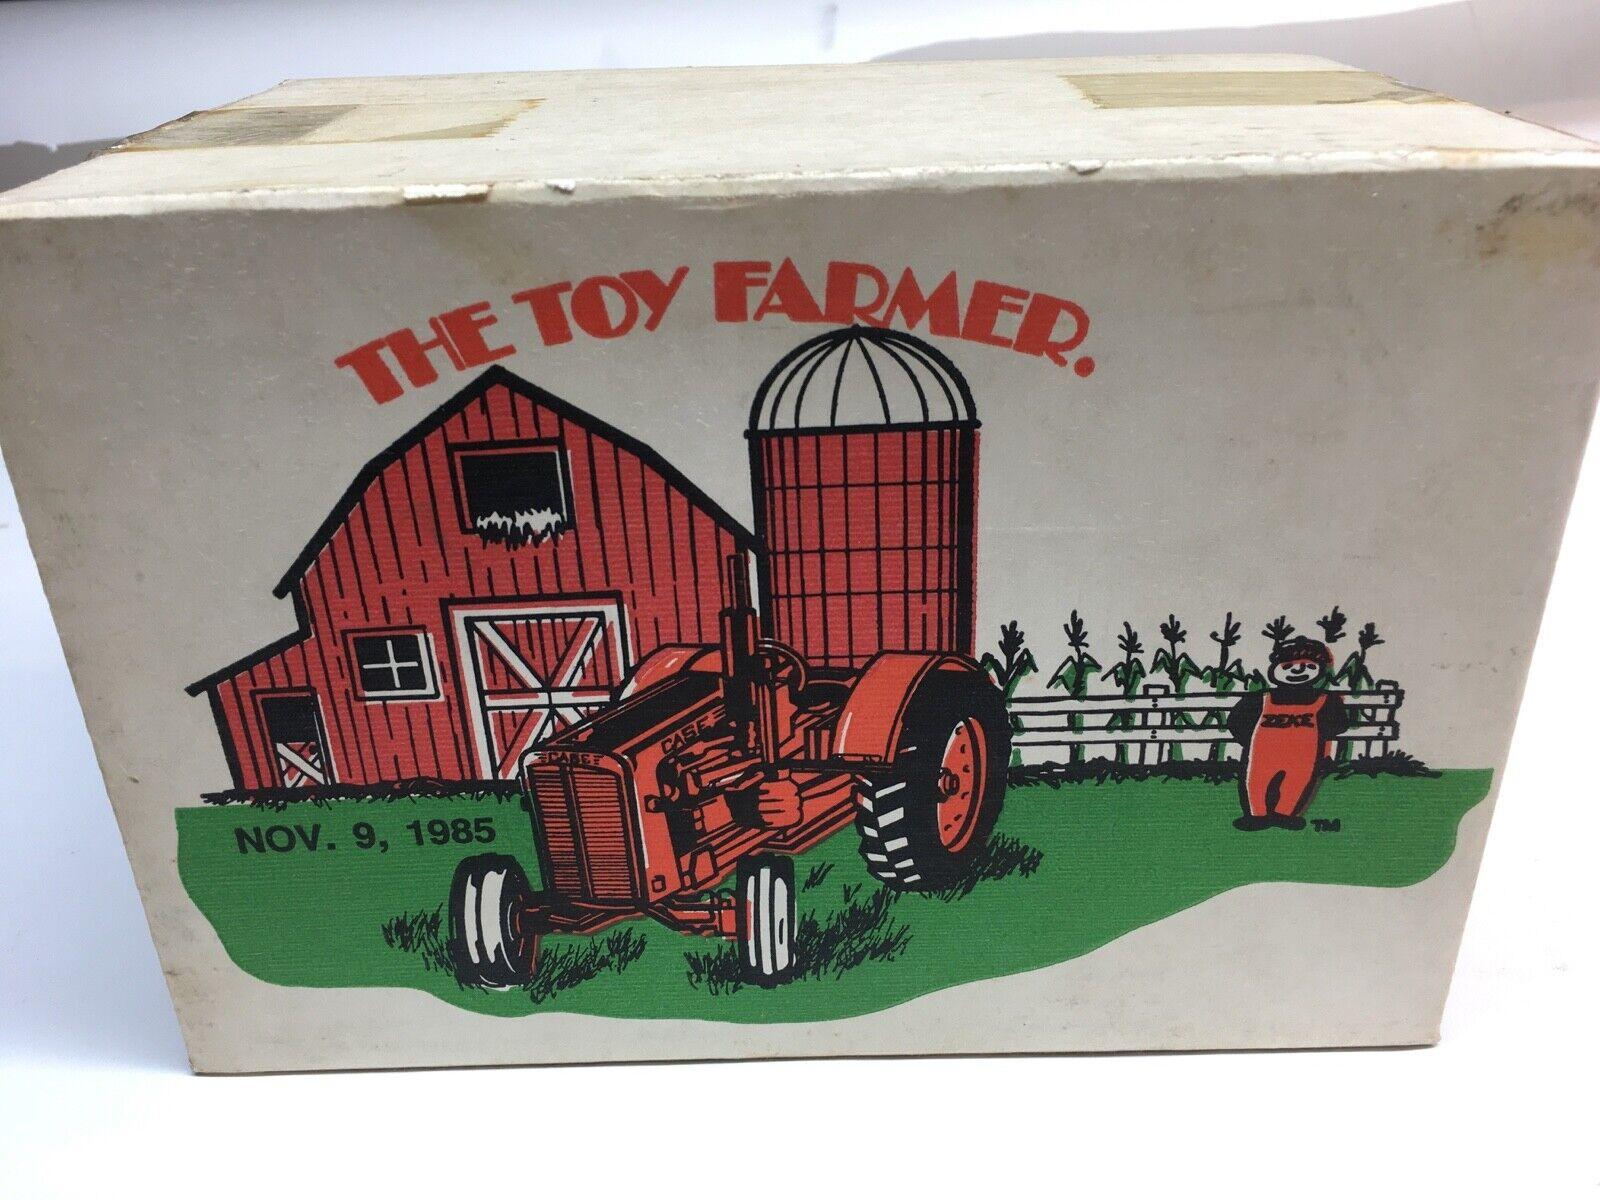 1 16 SCALE CASE MODEL 500 TRACTOR 1985 1985 1985 TOY FARMER c0d528